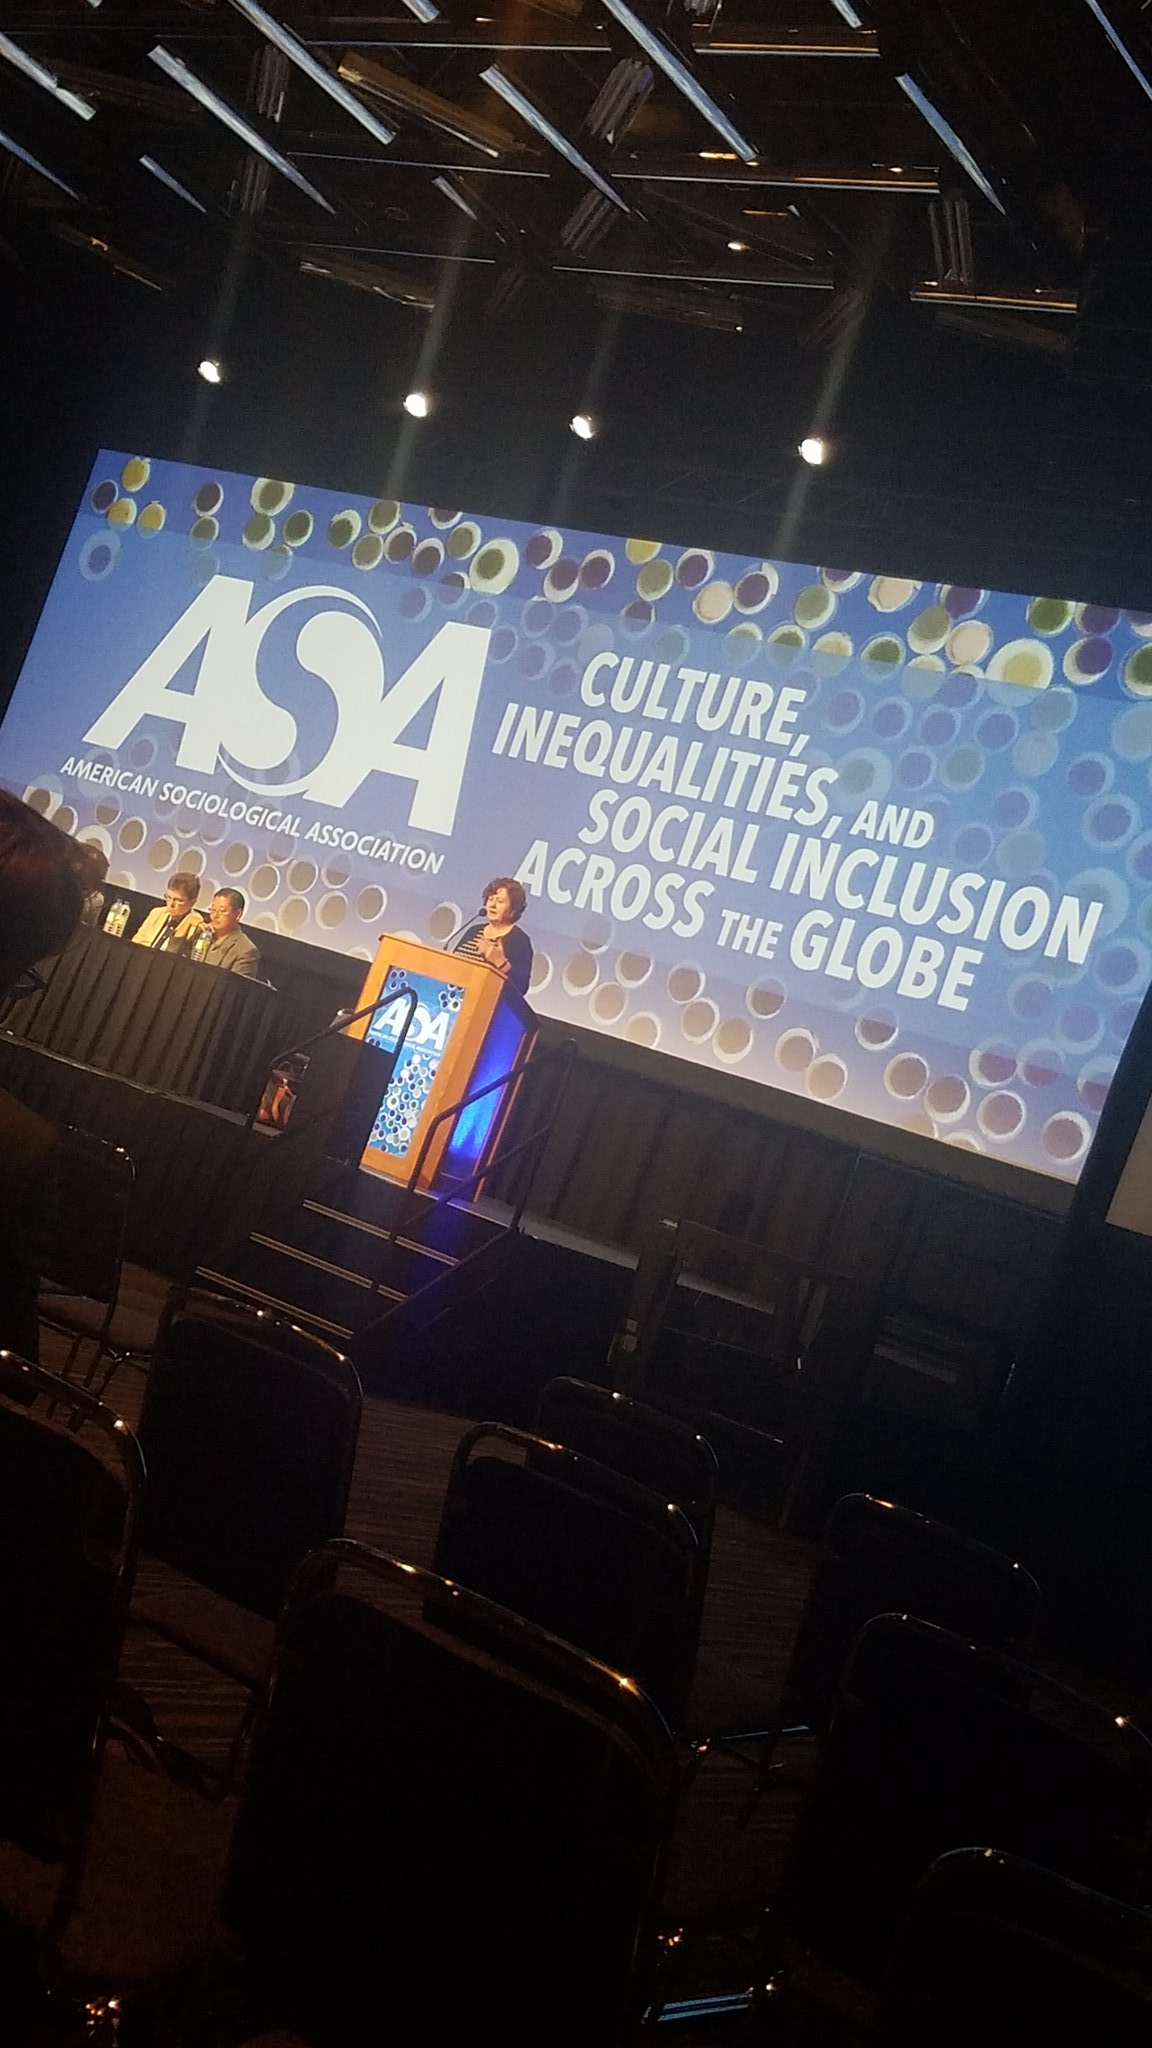 Thumbnail for #ASA17 diversity convo